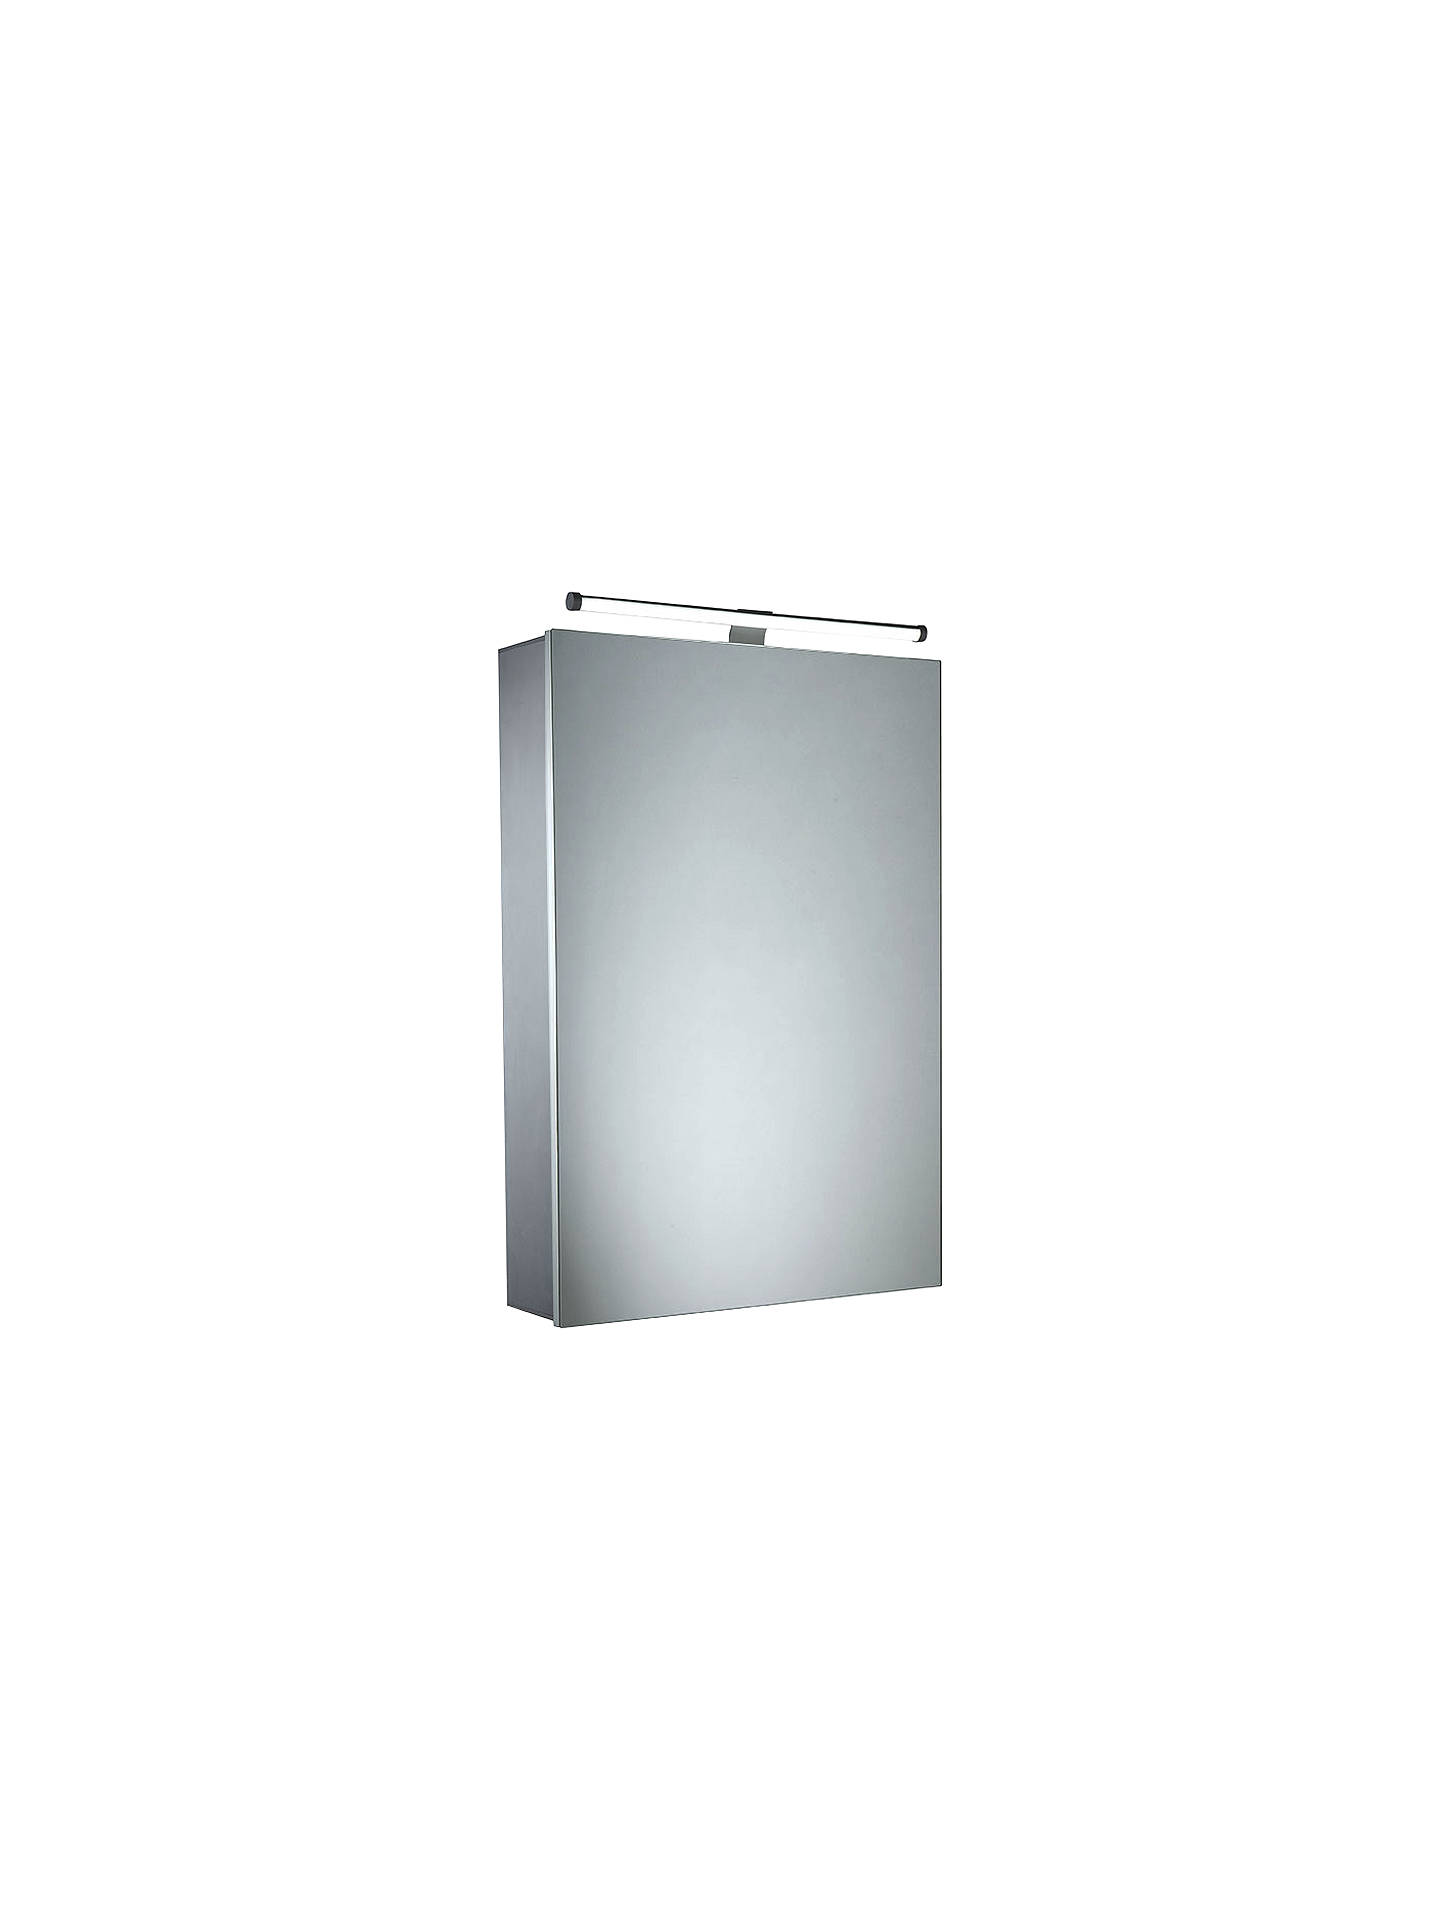 Cheap Illuminated Bathroom Mirrors: Roper Rhodes Conduct Illuminated Single Bathroom Cabinet